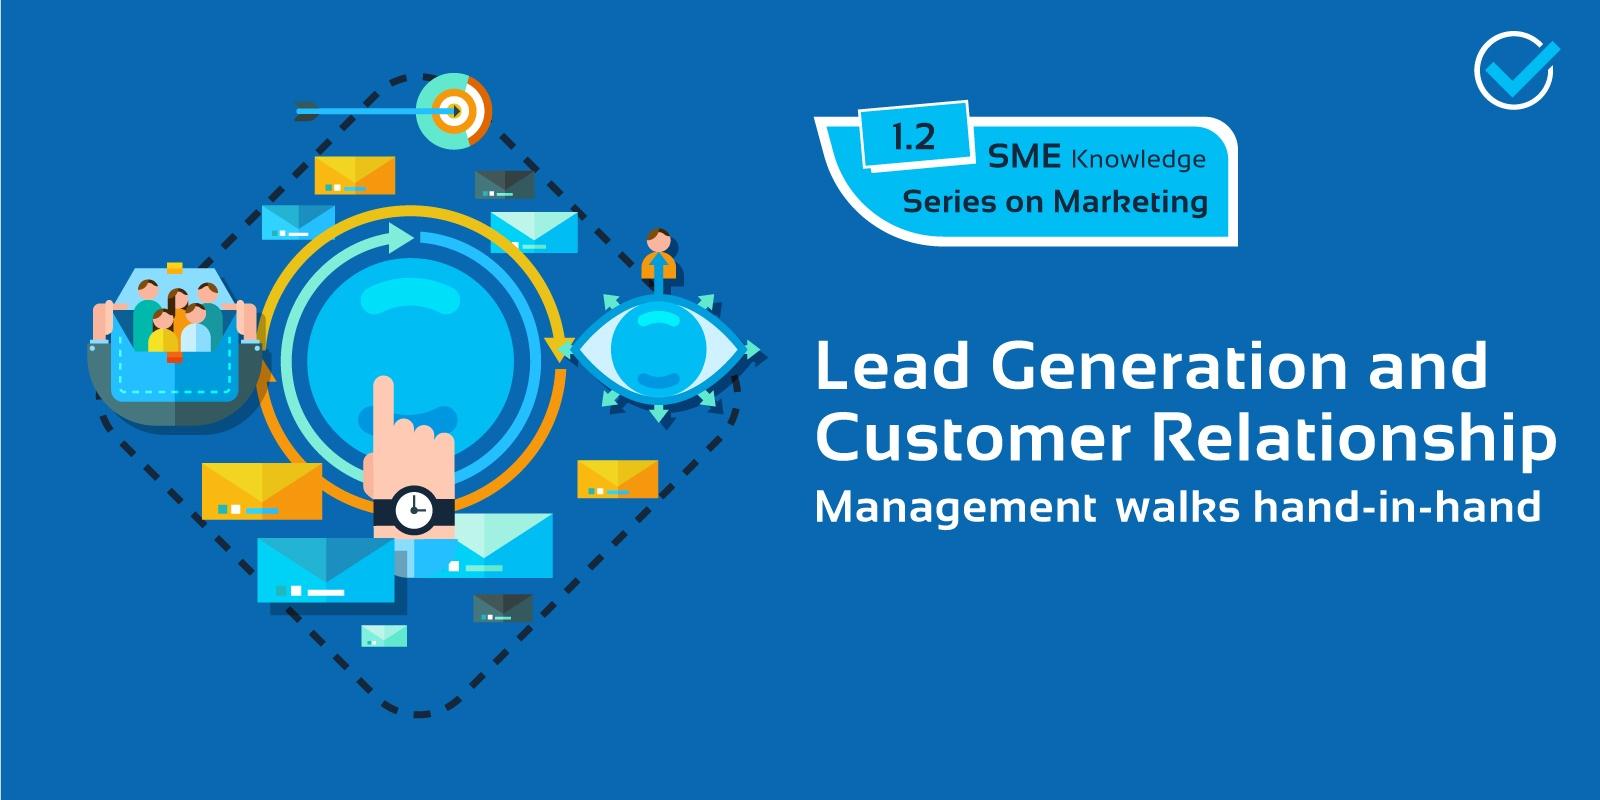 Lead Generation & CRM walks hand-in-hand